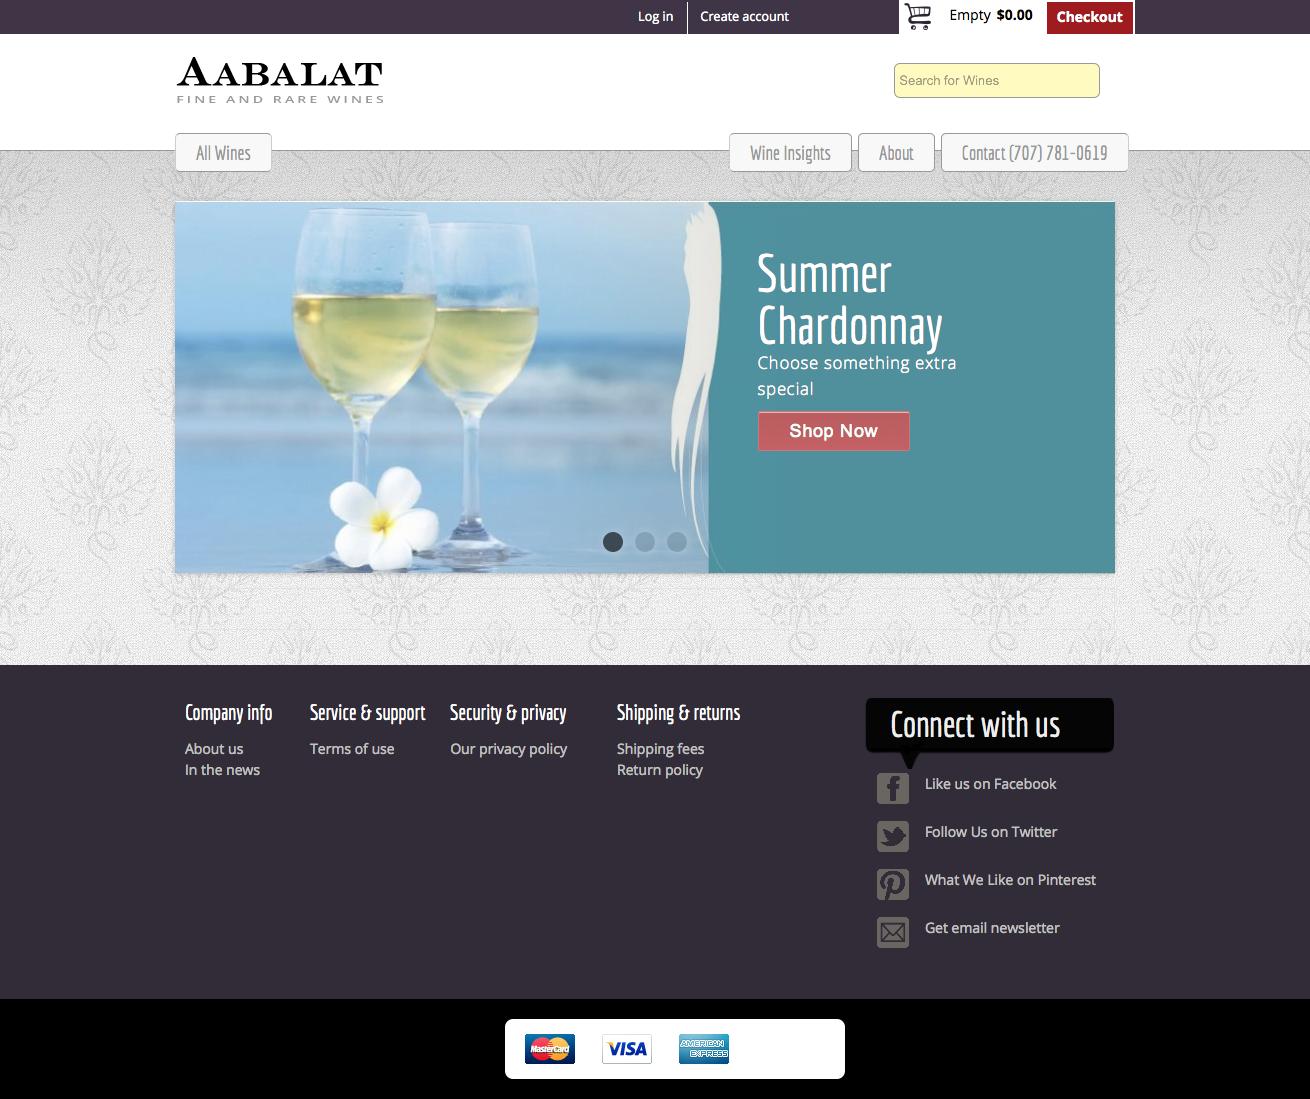 aabalat.com